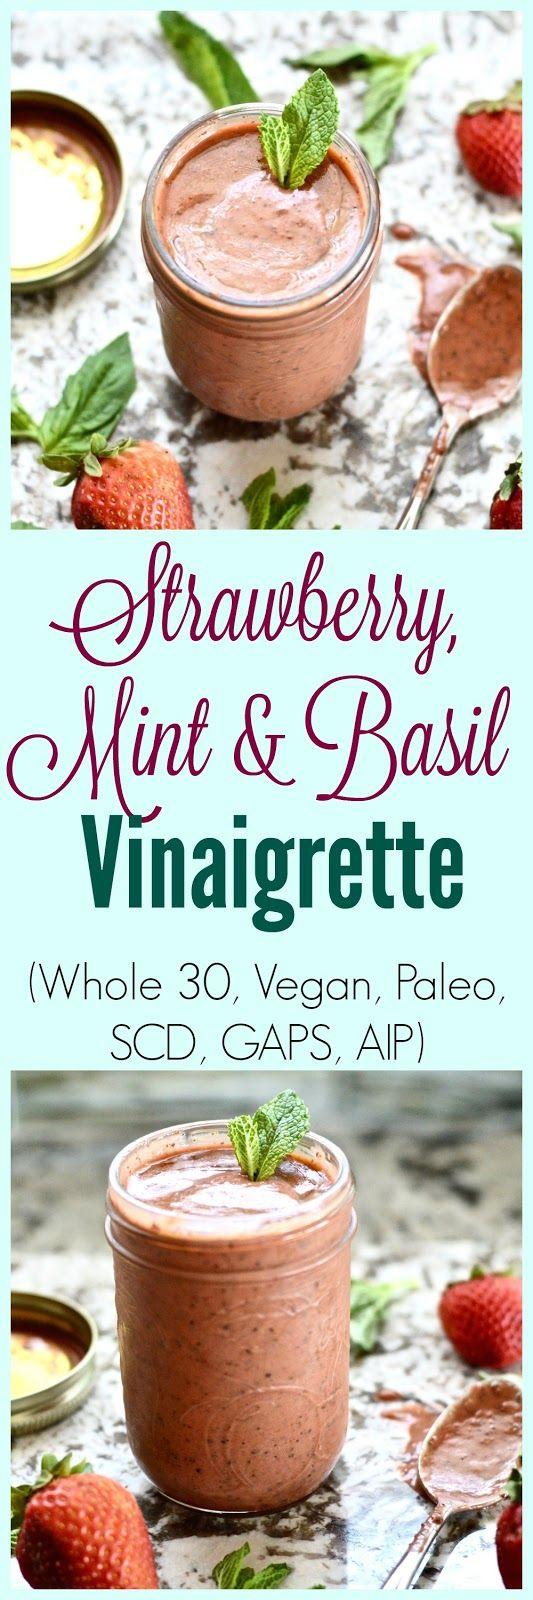 Pure and Simple Nourishment : Strawberry, Mint and Basil Vinaigrette (Paleo, Vegan, Whole 30, Low FODMAPS, AIP, SCD, GAPS)